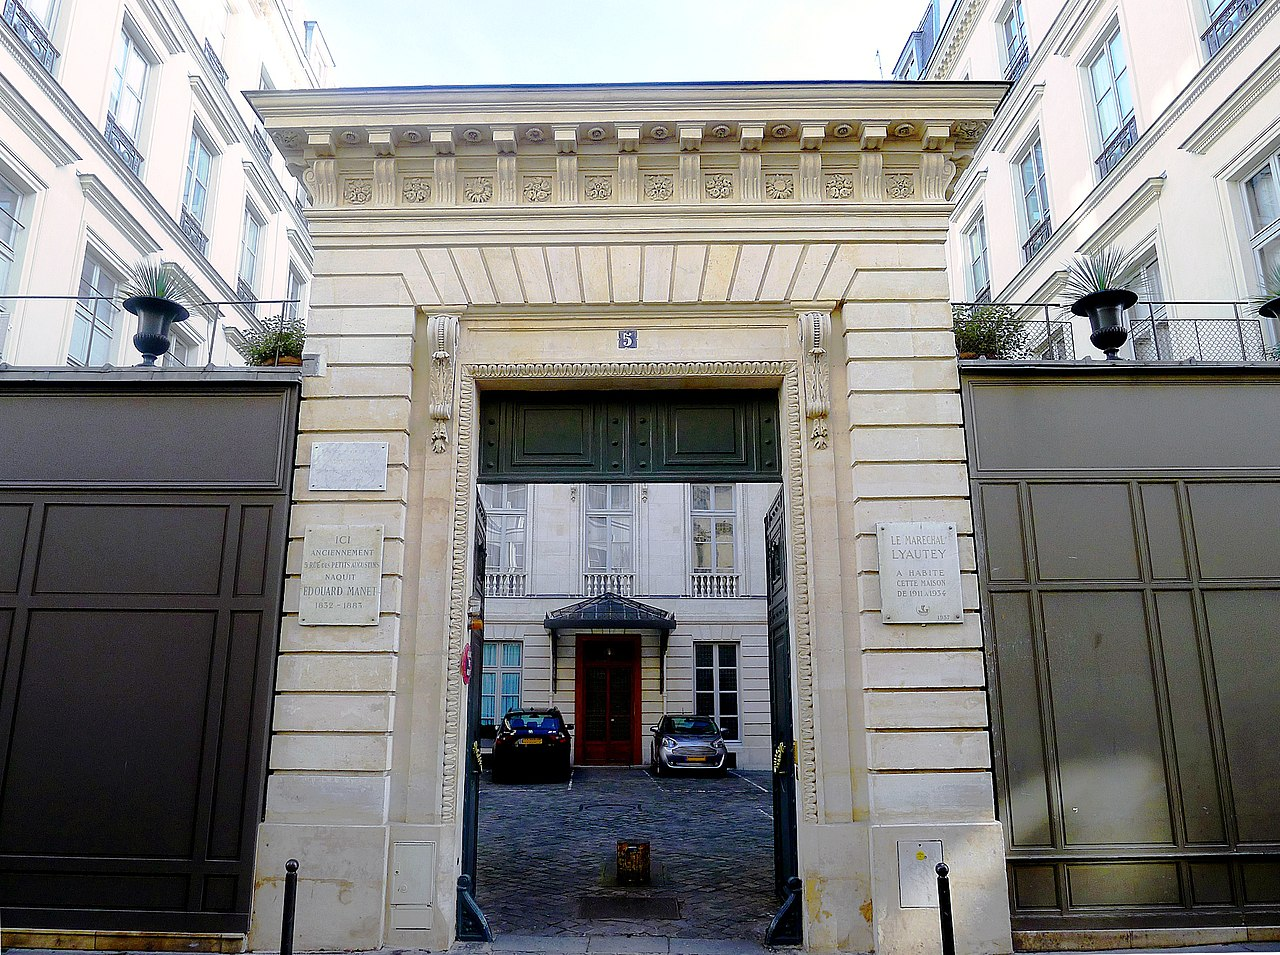 File p1070498 paris vi rue bonaparte n 5 rwk jpg wikimedia commons - Rue bonaparte paris 6 ...